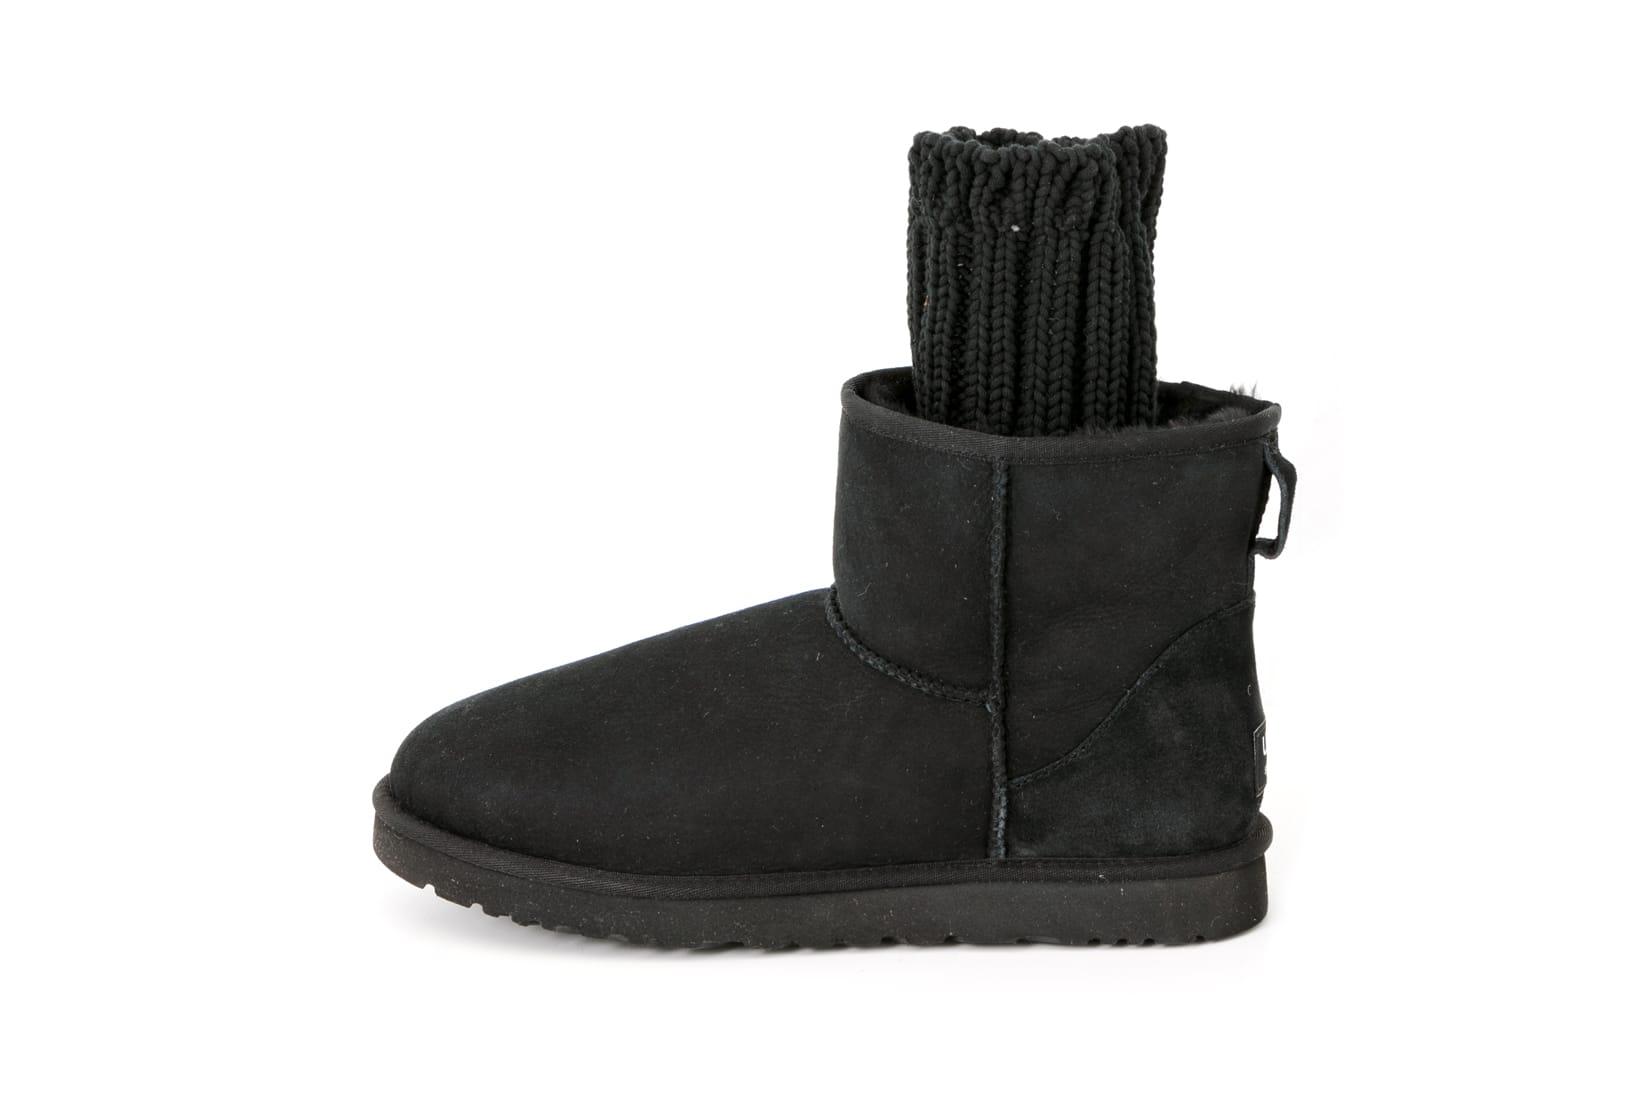 sacai x UGG 2018 Fall/Winter Footwear